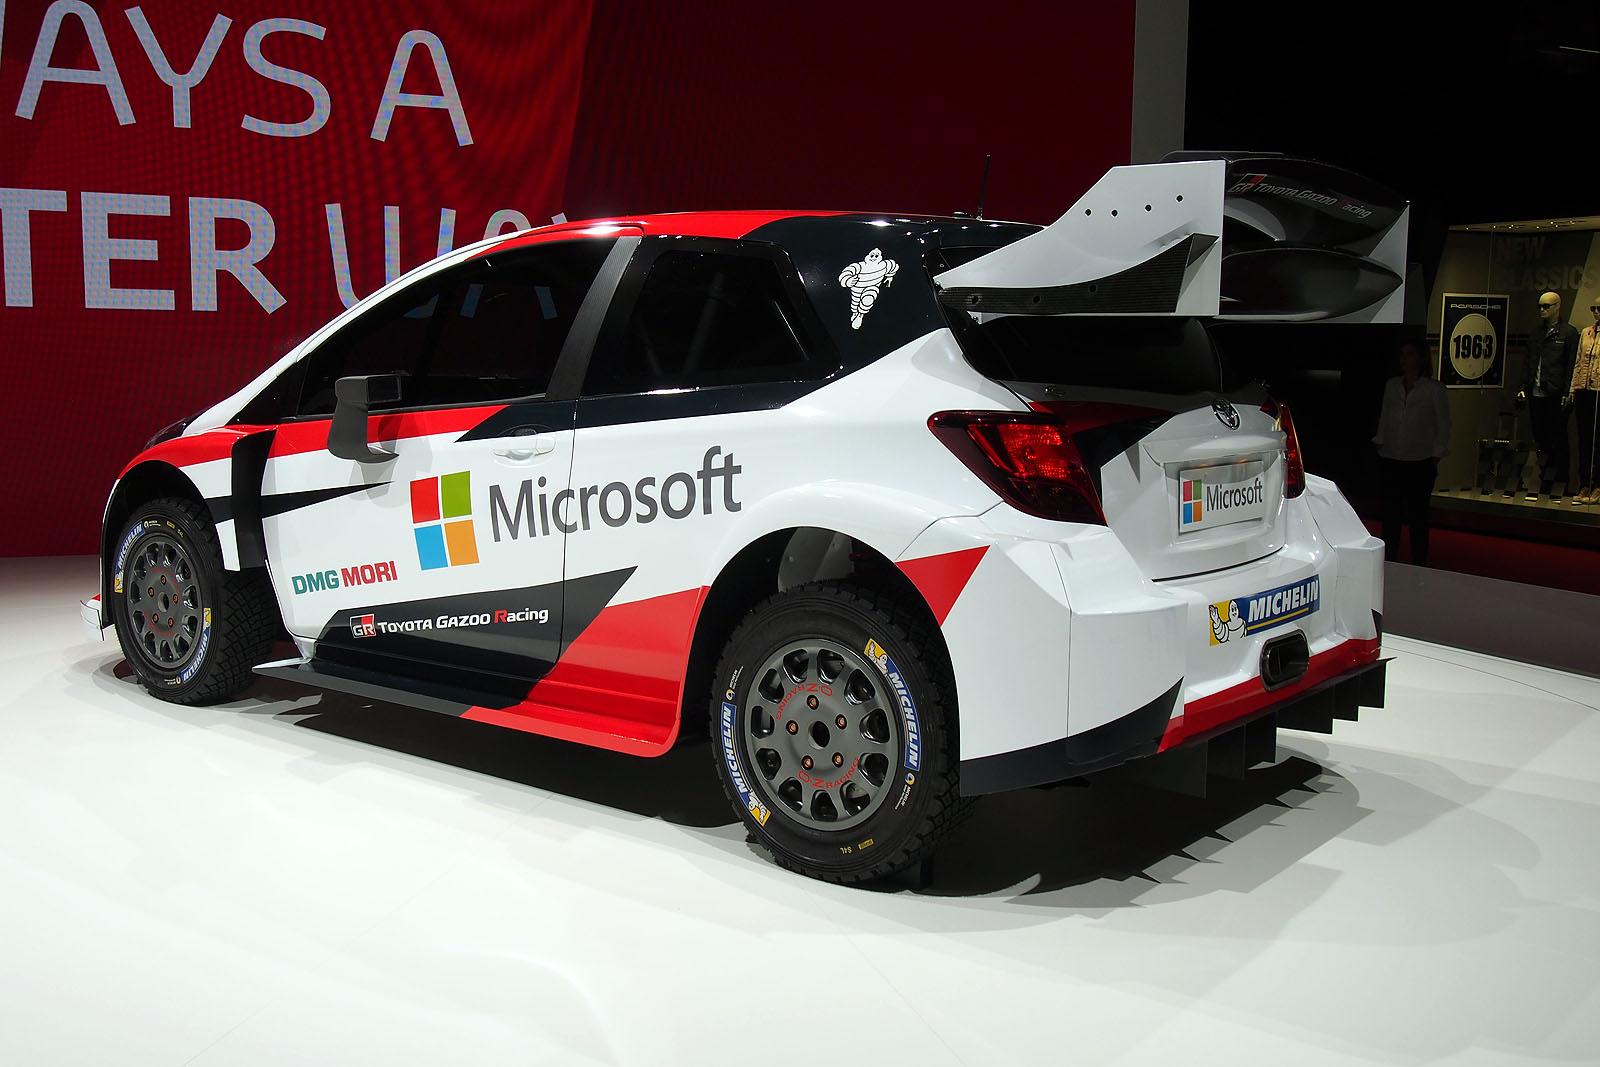 [Sport Automobile] Rallye (WRC, IRC) & autres Championnats - Page 9 Toyota-WRC-Cars-08